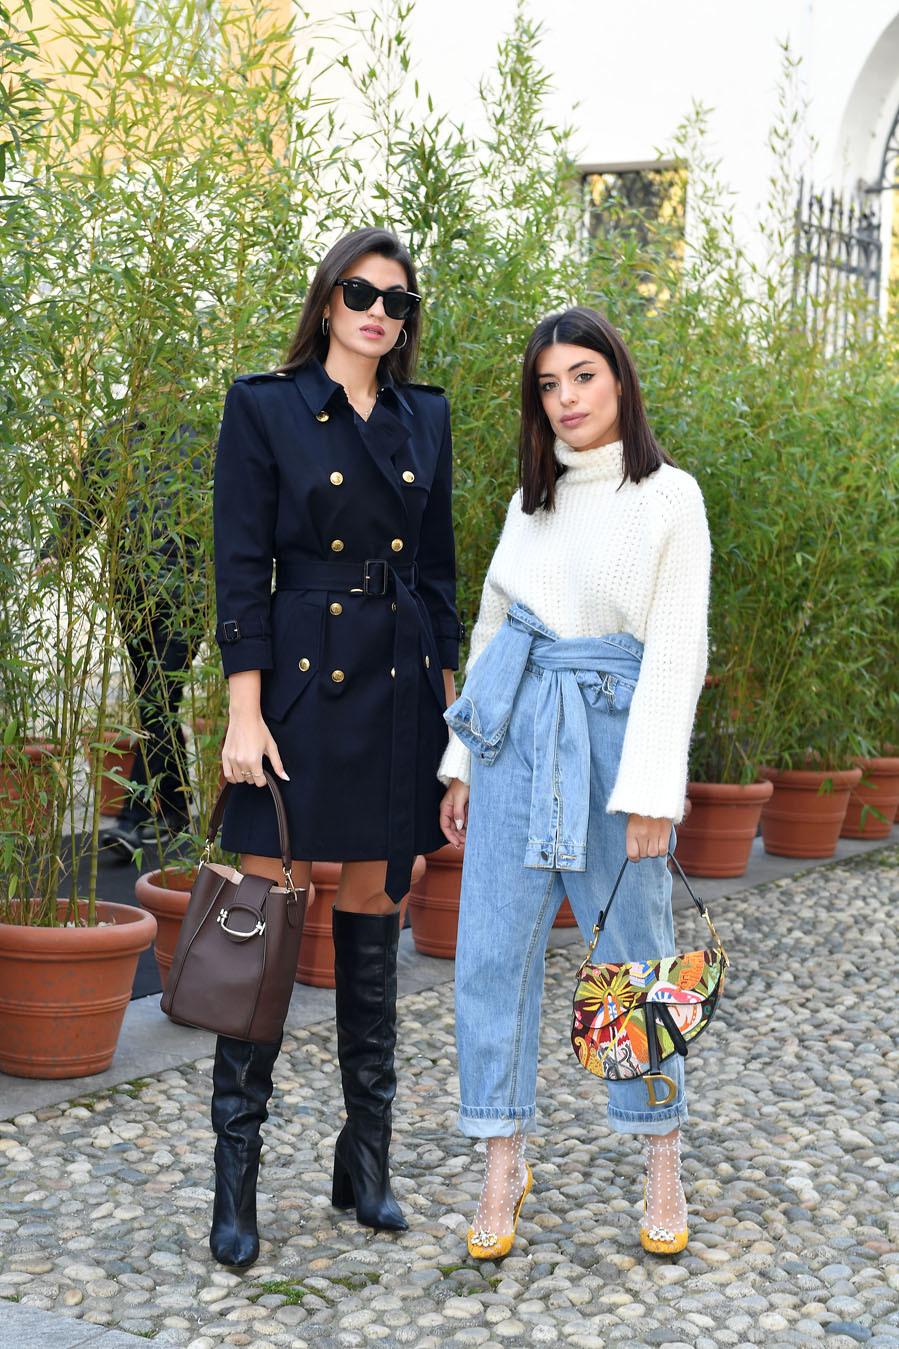 En Milán Y Lozano Fashion Tod's WeekMarta Dulceida Y7gvbfymI6